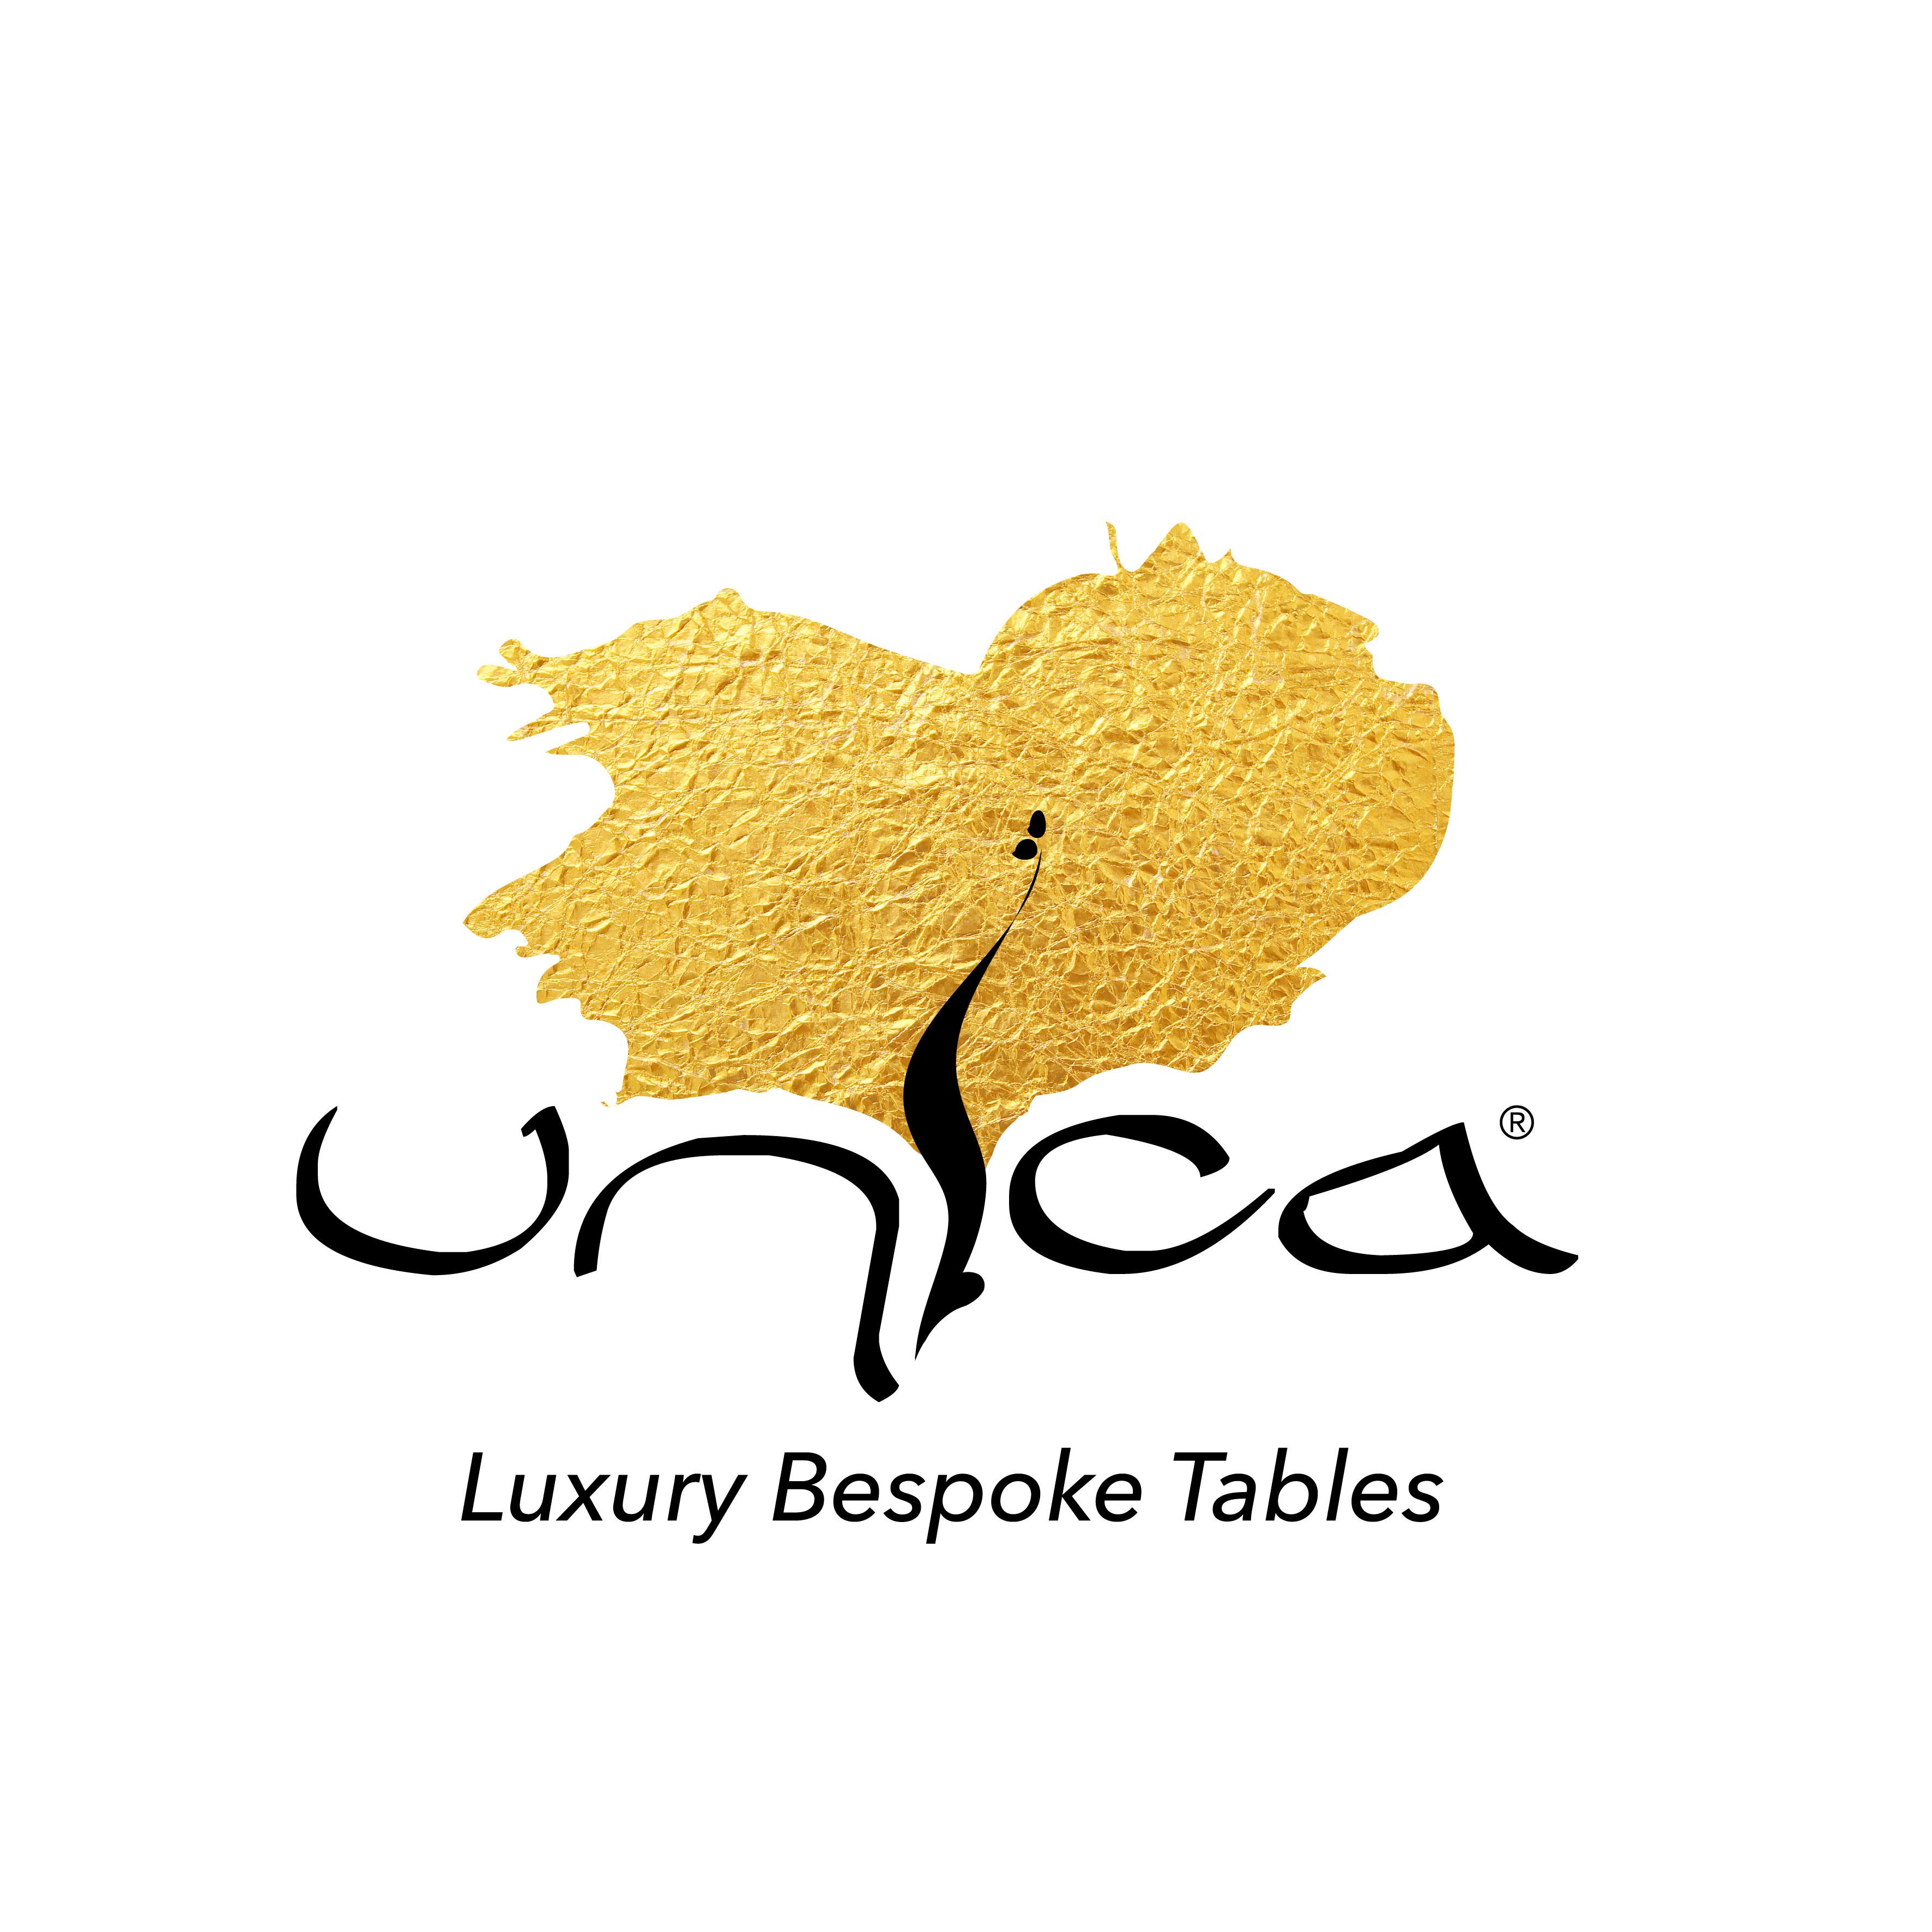 Tecnotelai - Unica